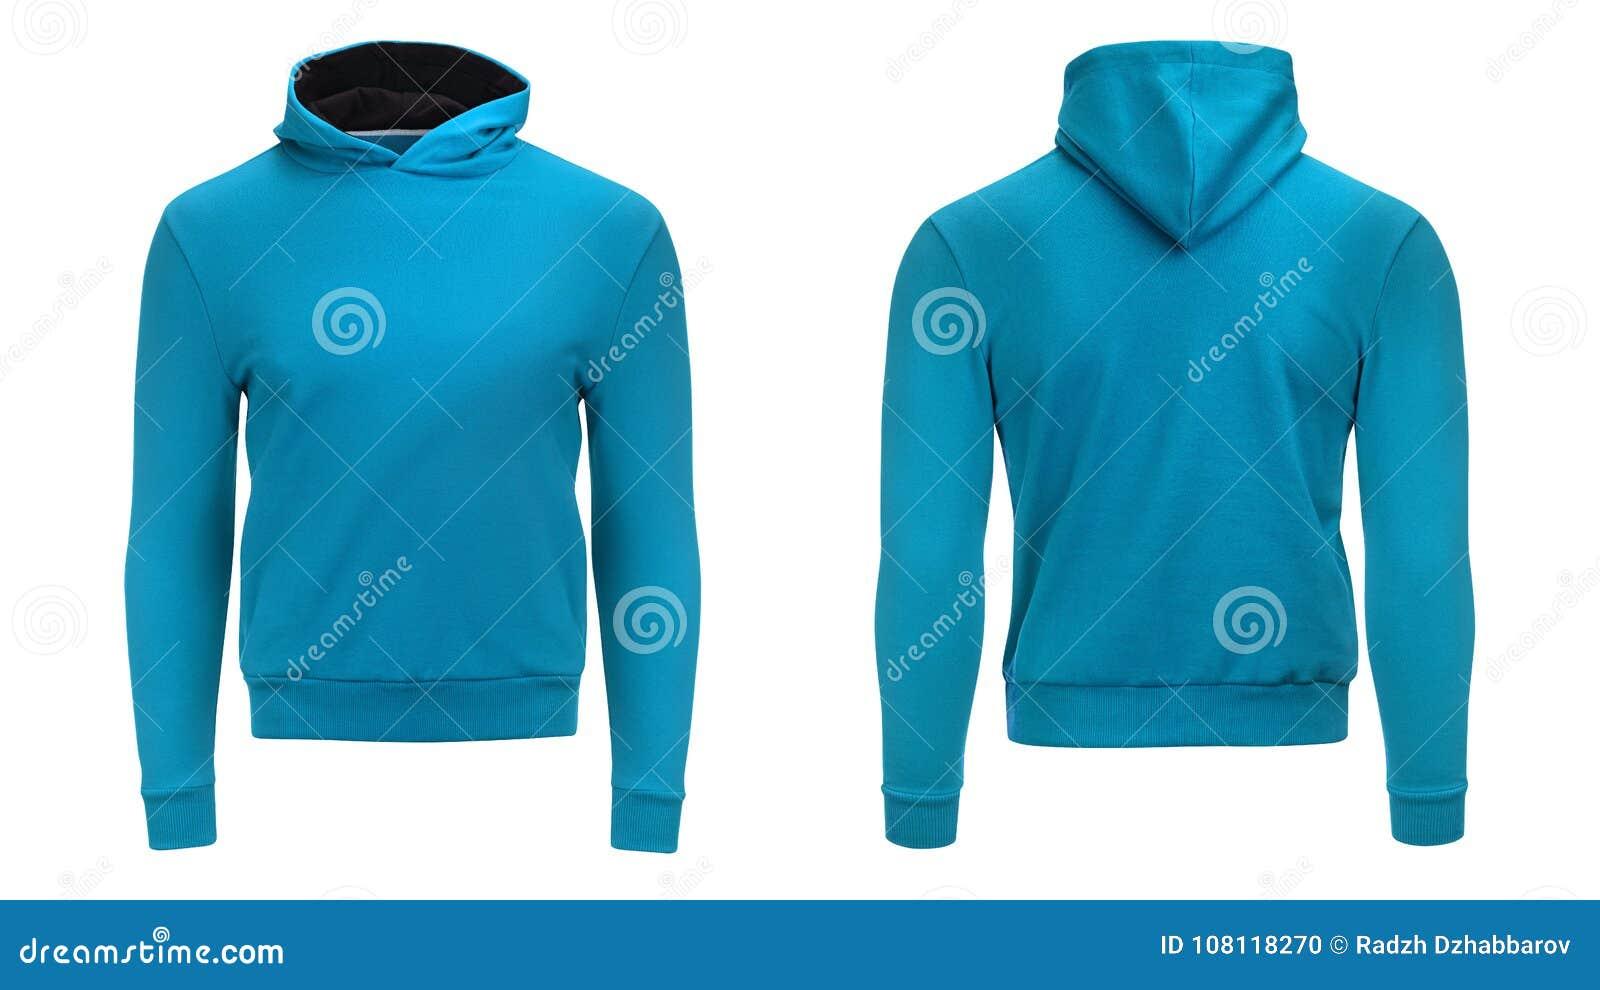 432914ba82b Blank Blue Hoodie Sweatshirt With Clipping Path